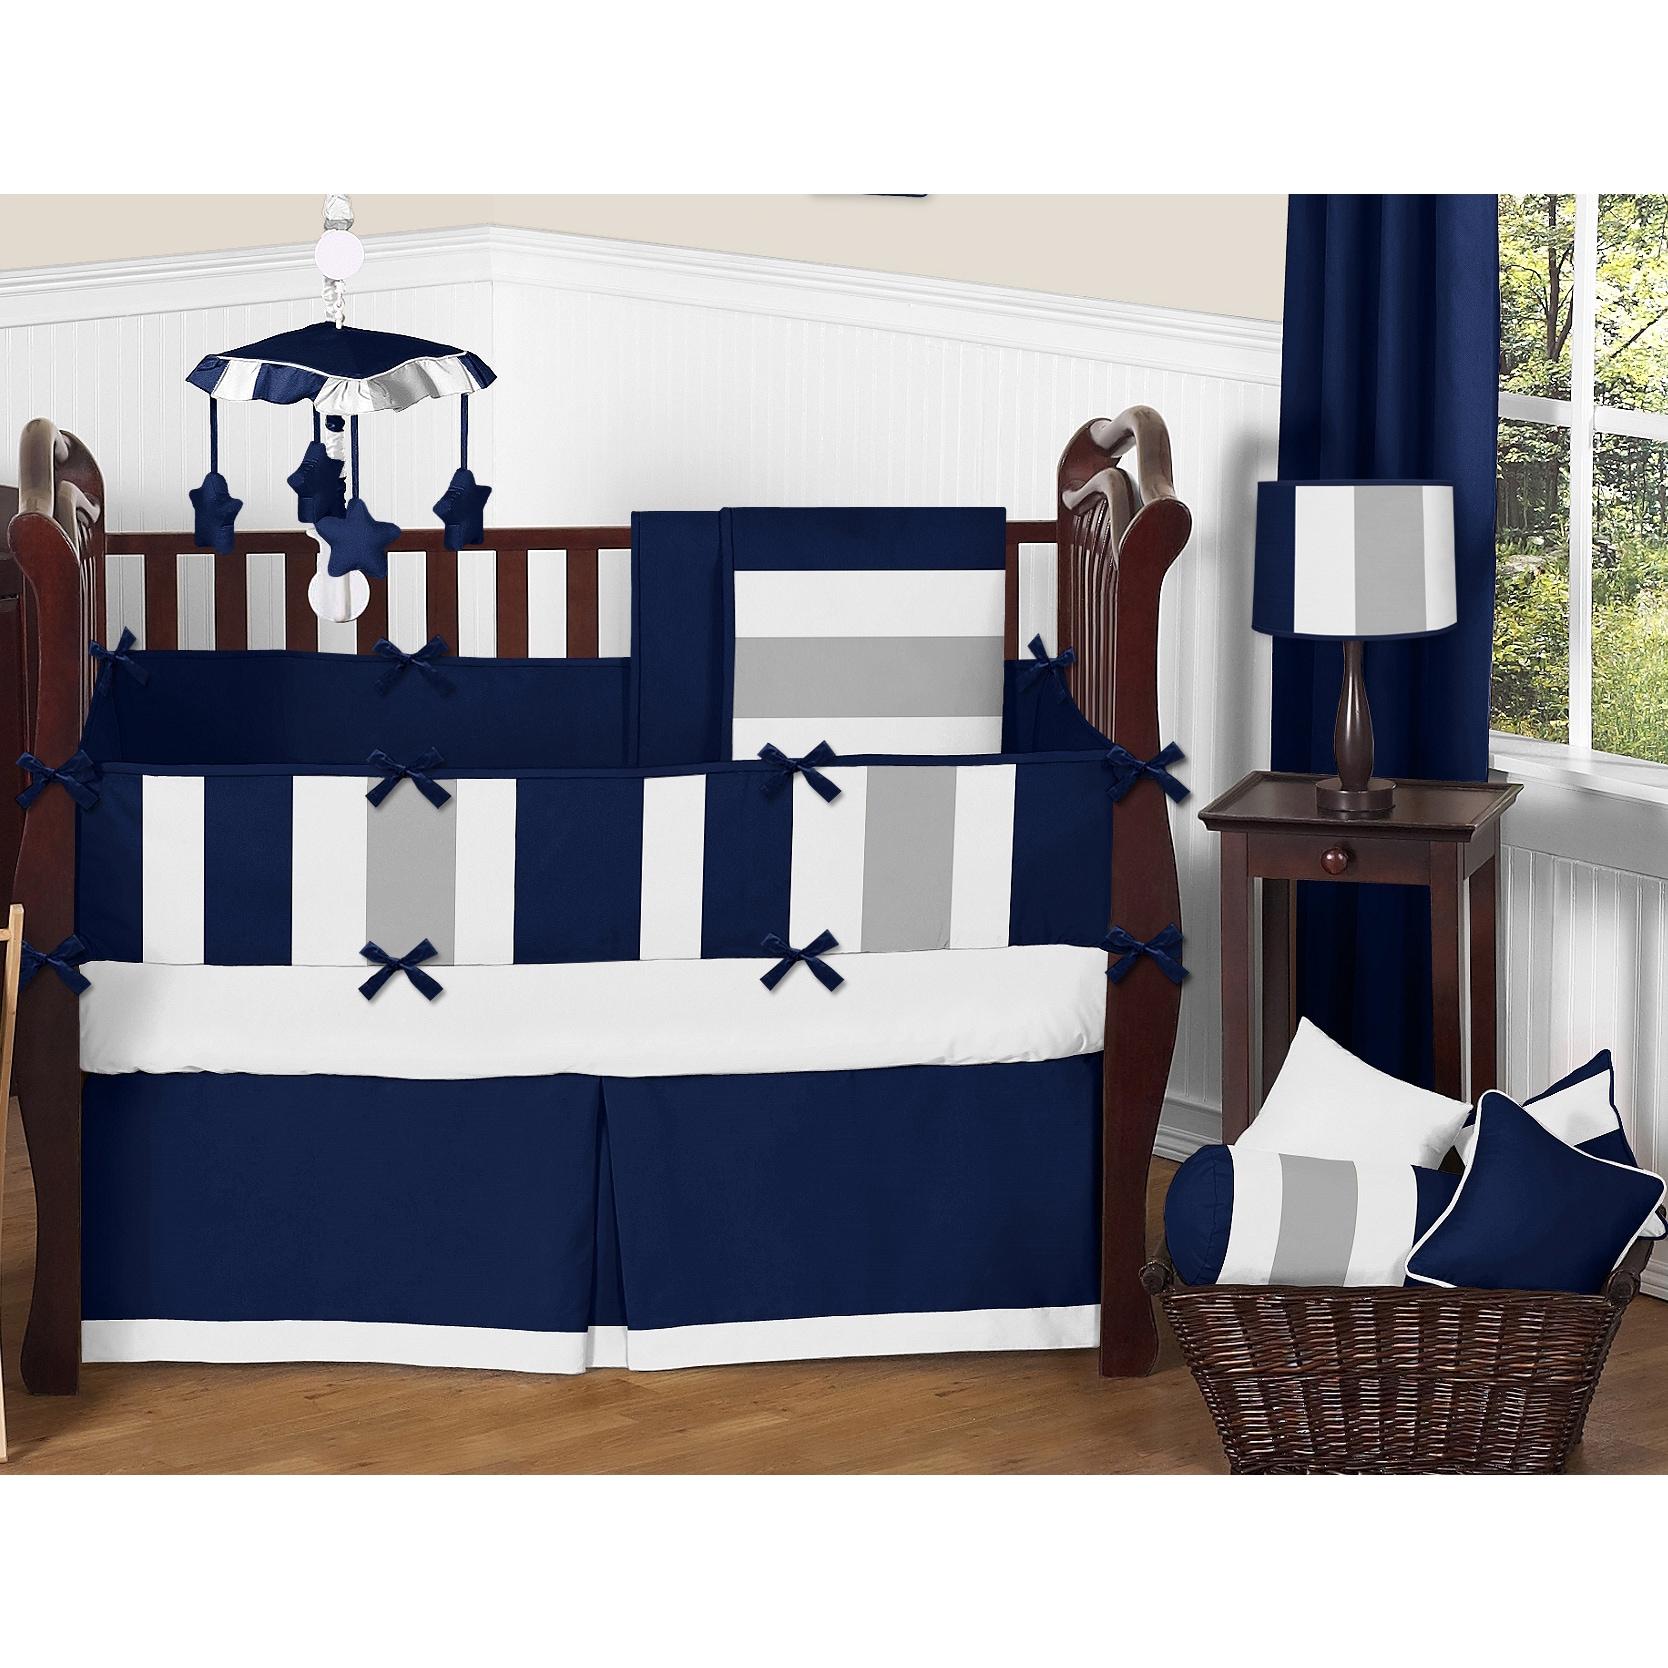 Sweet Jojo Designs Navy Blue And Grey Striped Microfiber Collection 9 Piece Crib Bedding Set